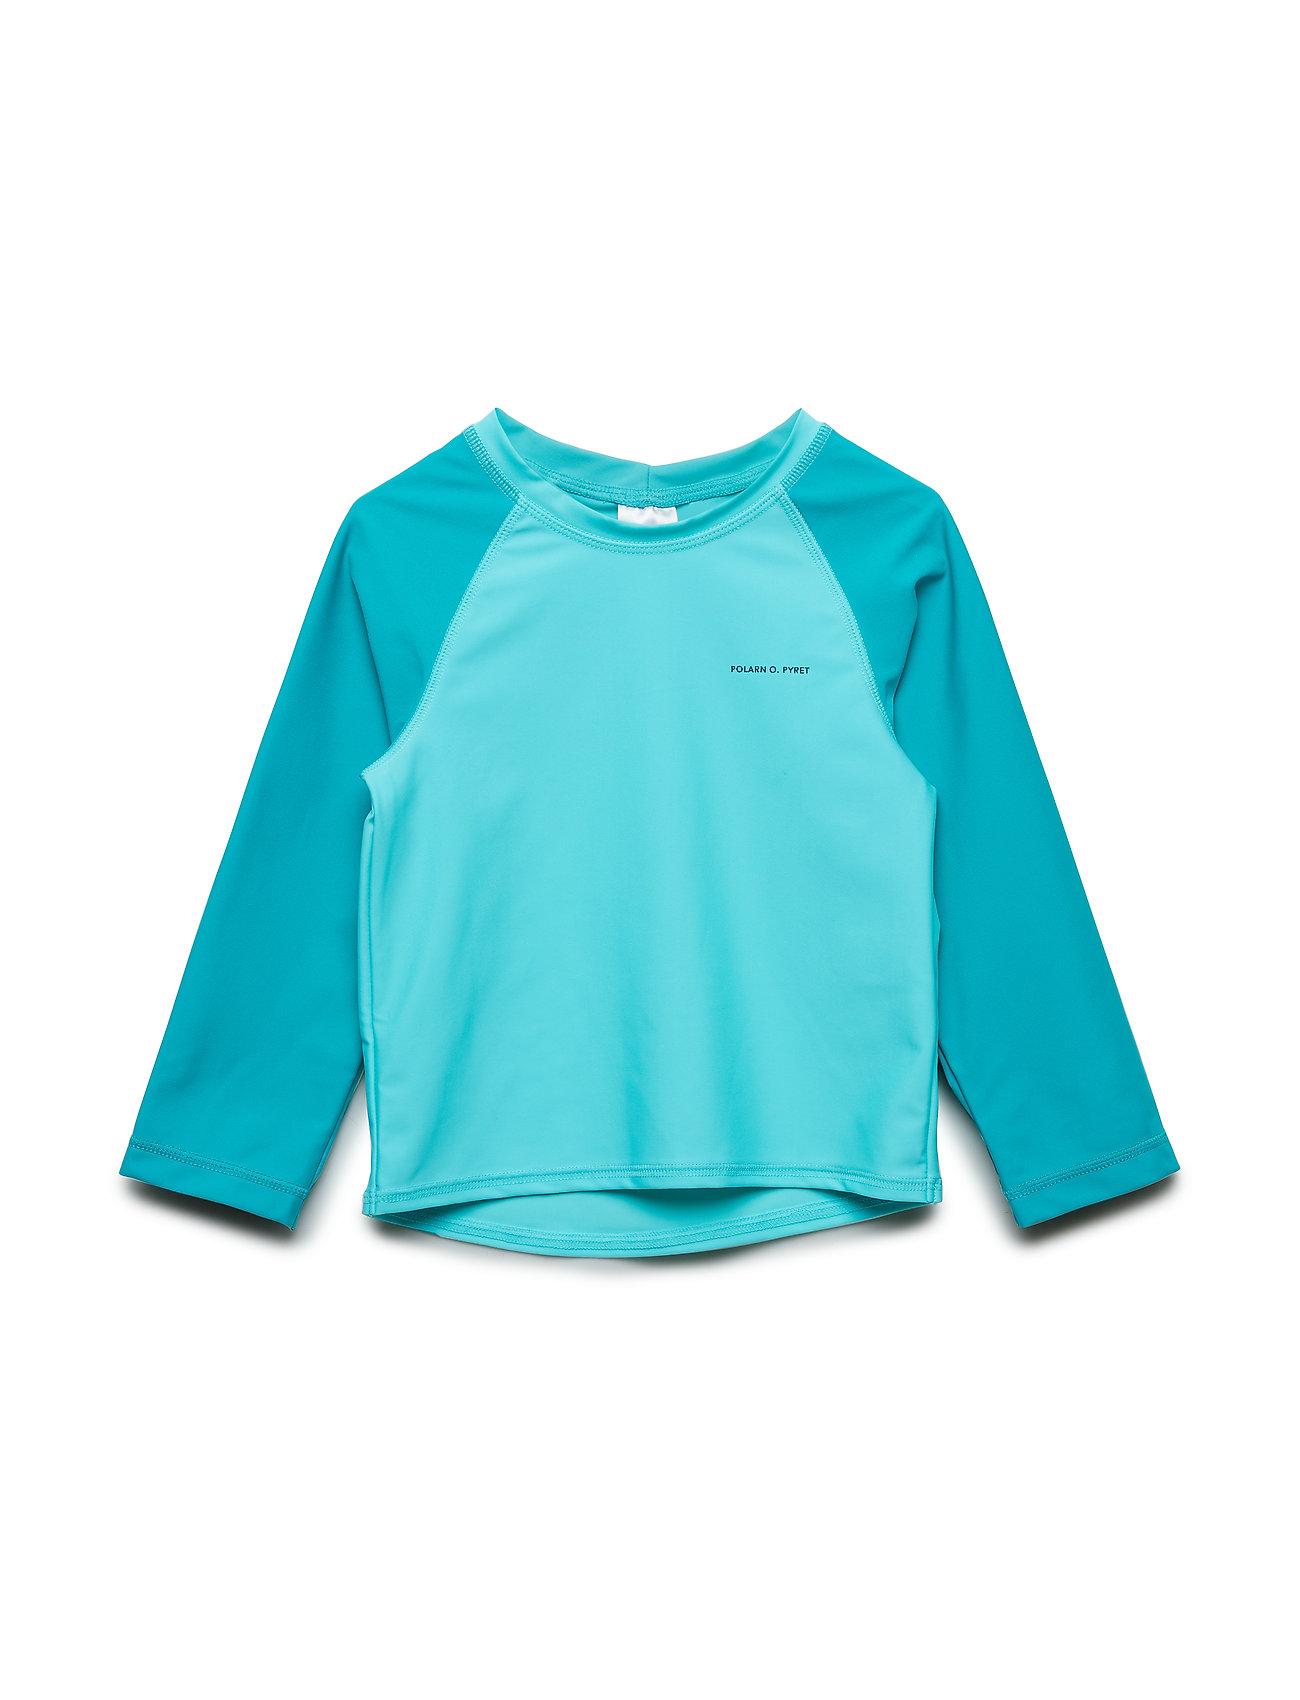 Polarn O. Pyret Swimwear Top l/s UPF Preschool - LATIGO BAY